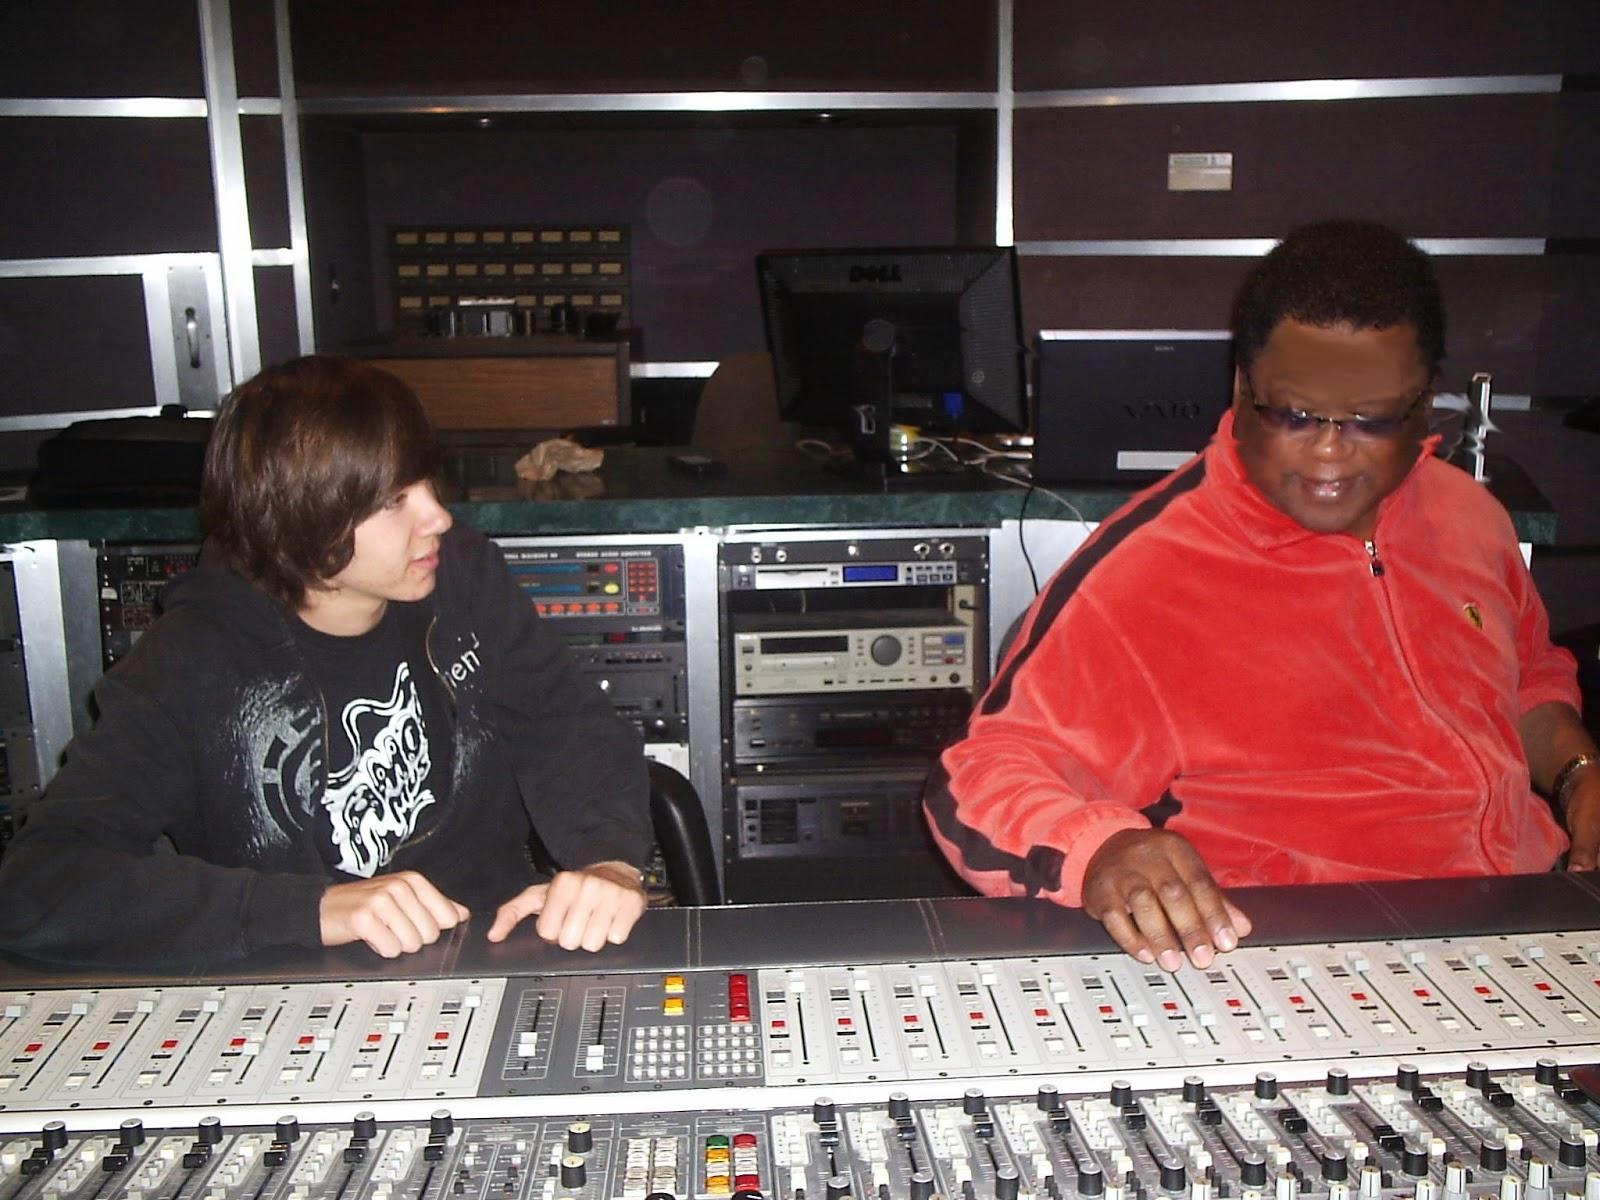 Jim Gardiner at Pajama Studio with mentoring student